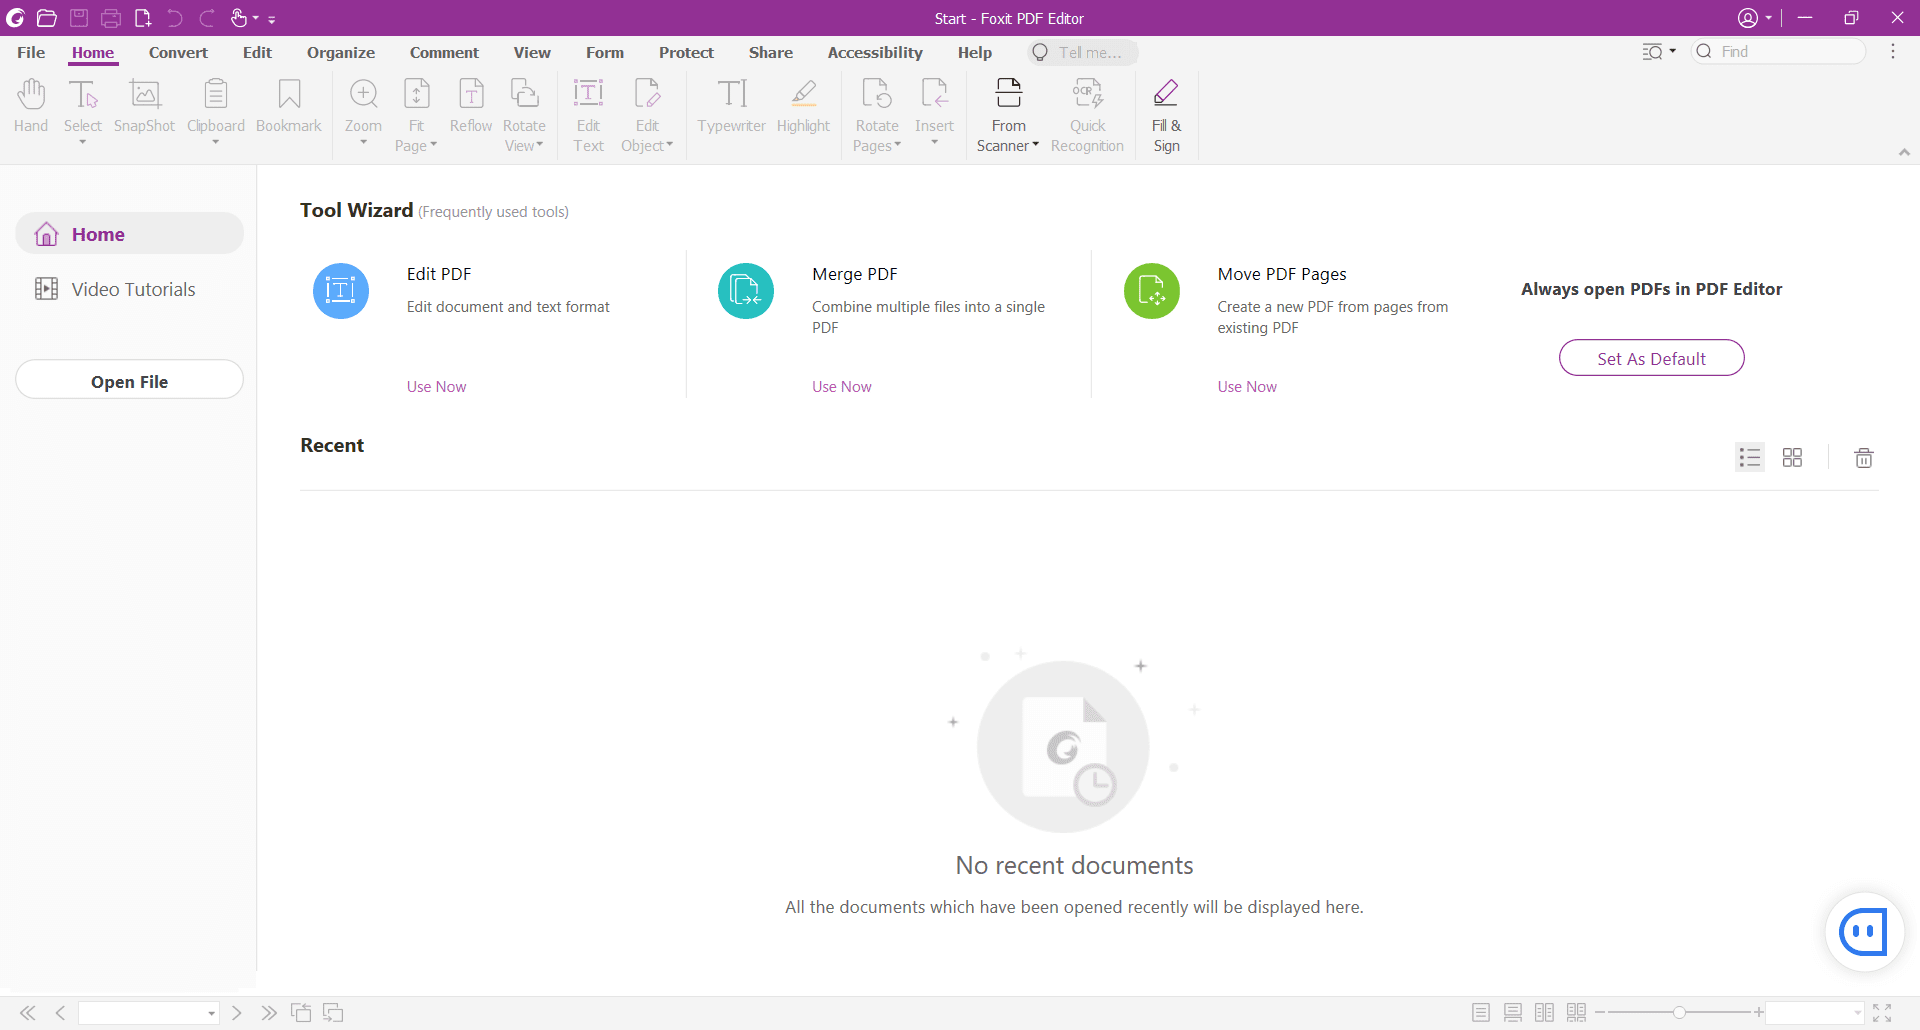 Foxit PDF Editor Main Interface Screenshot